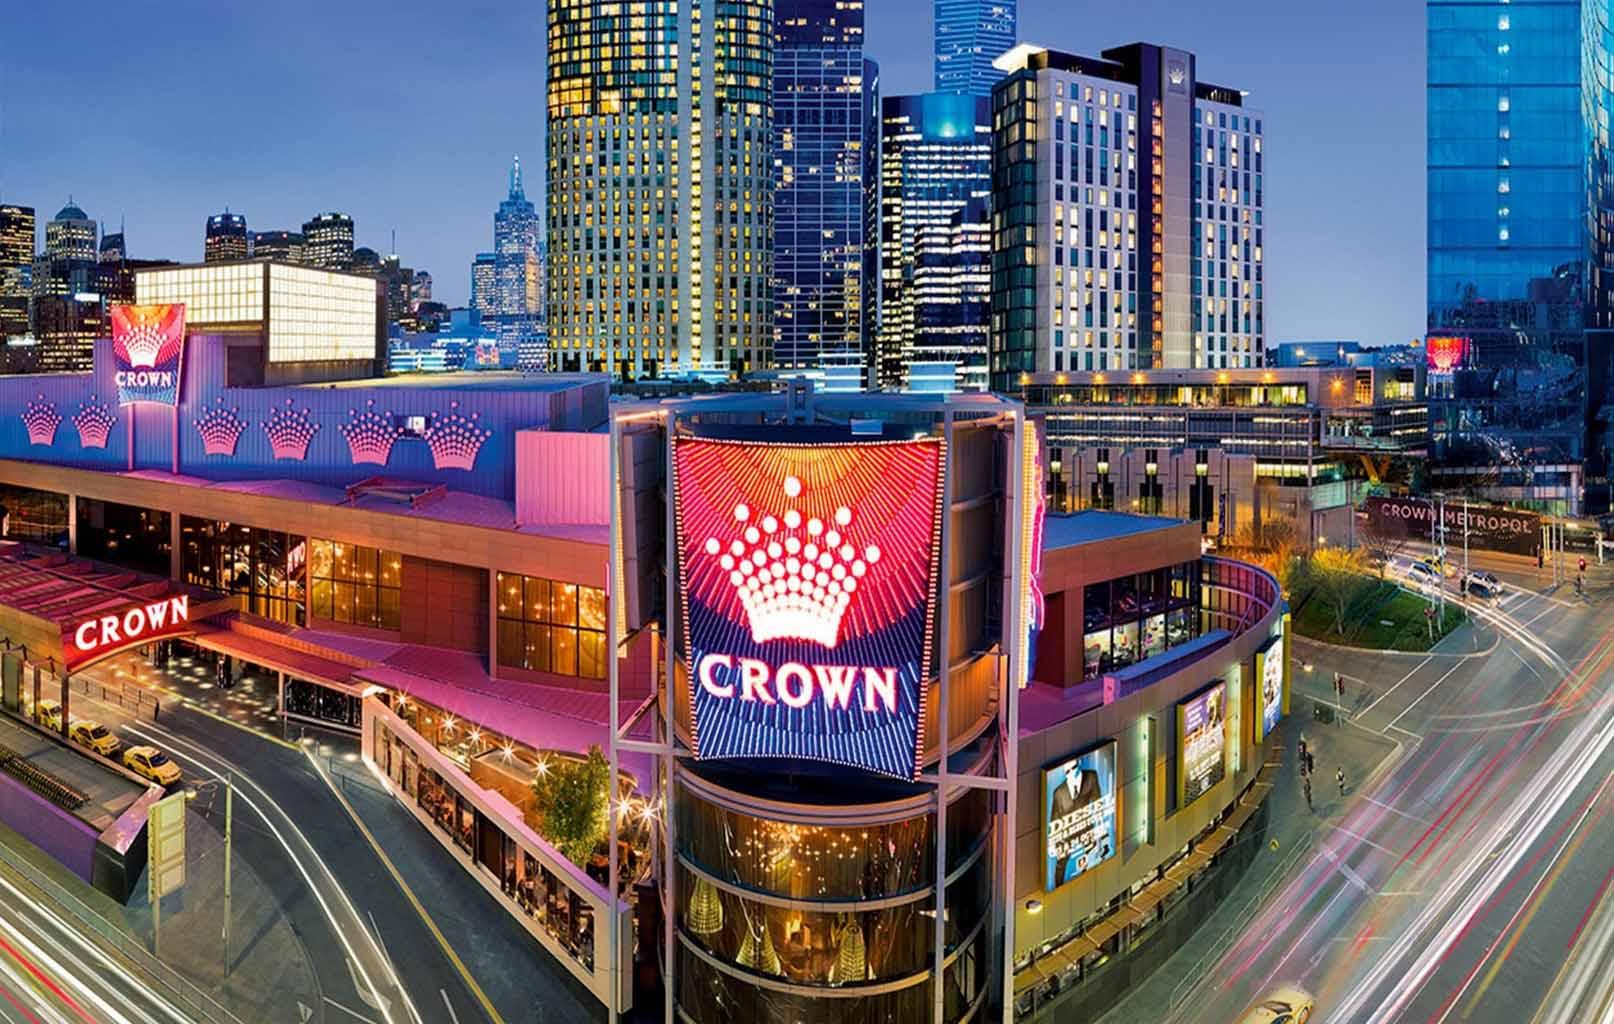 Sòng bài Crown Casino Melbourne